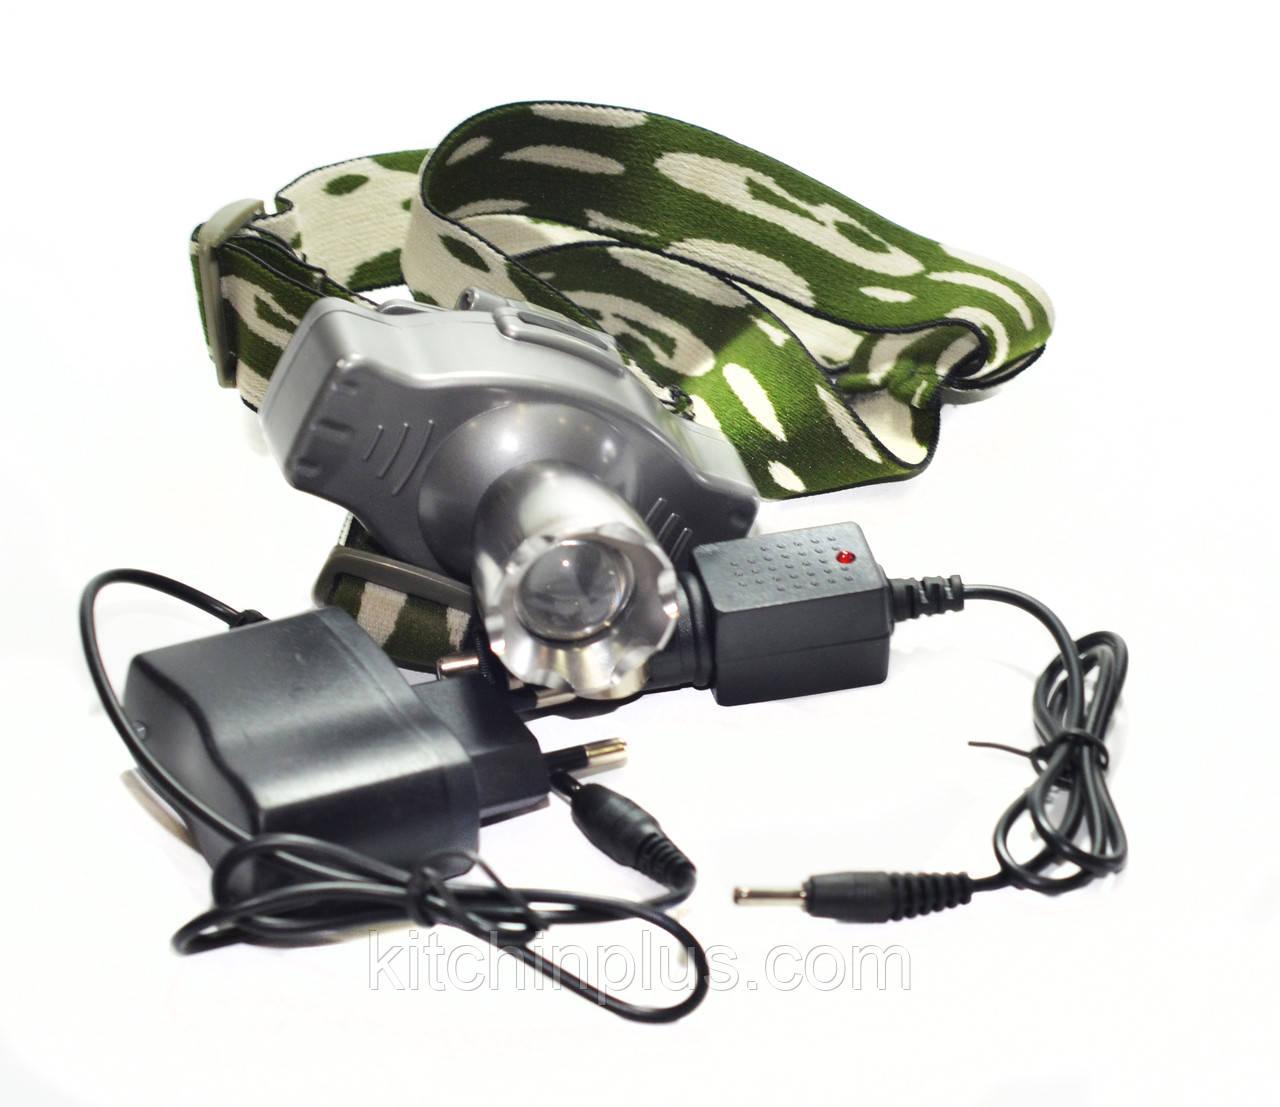 Налобный фонарь Bailong Police BL-HZ-008 6000W